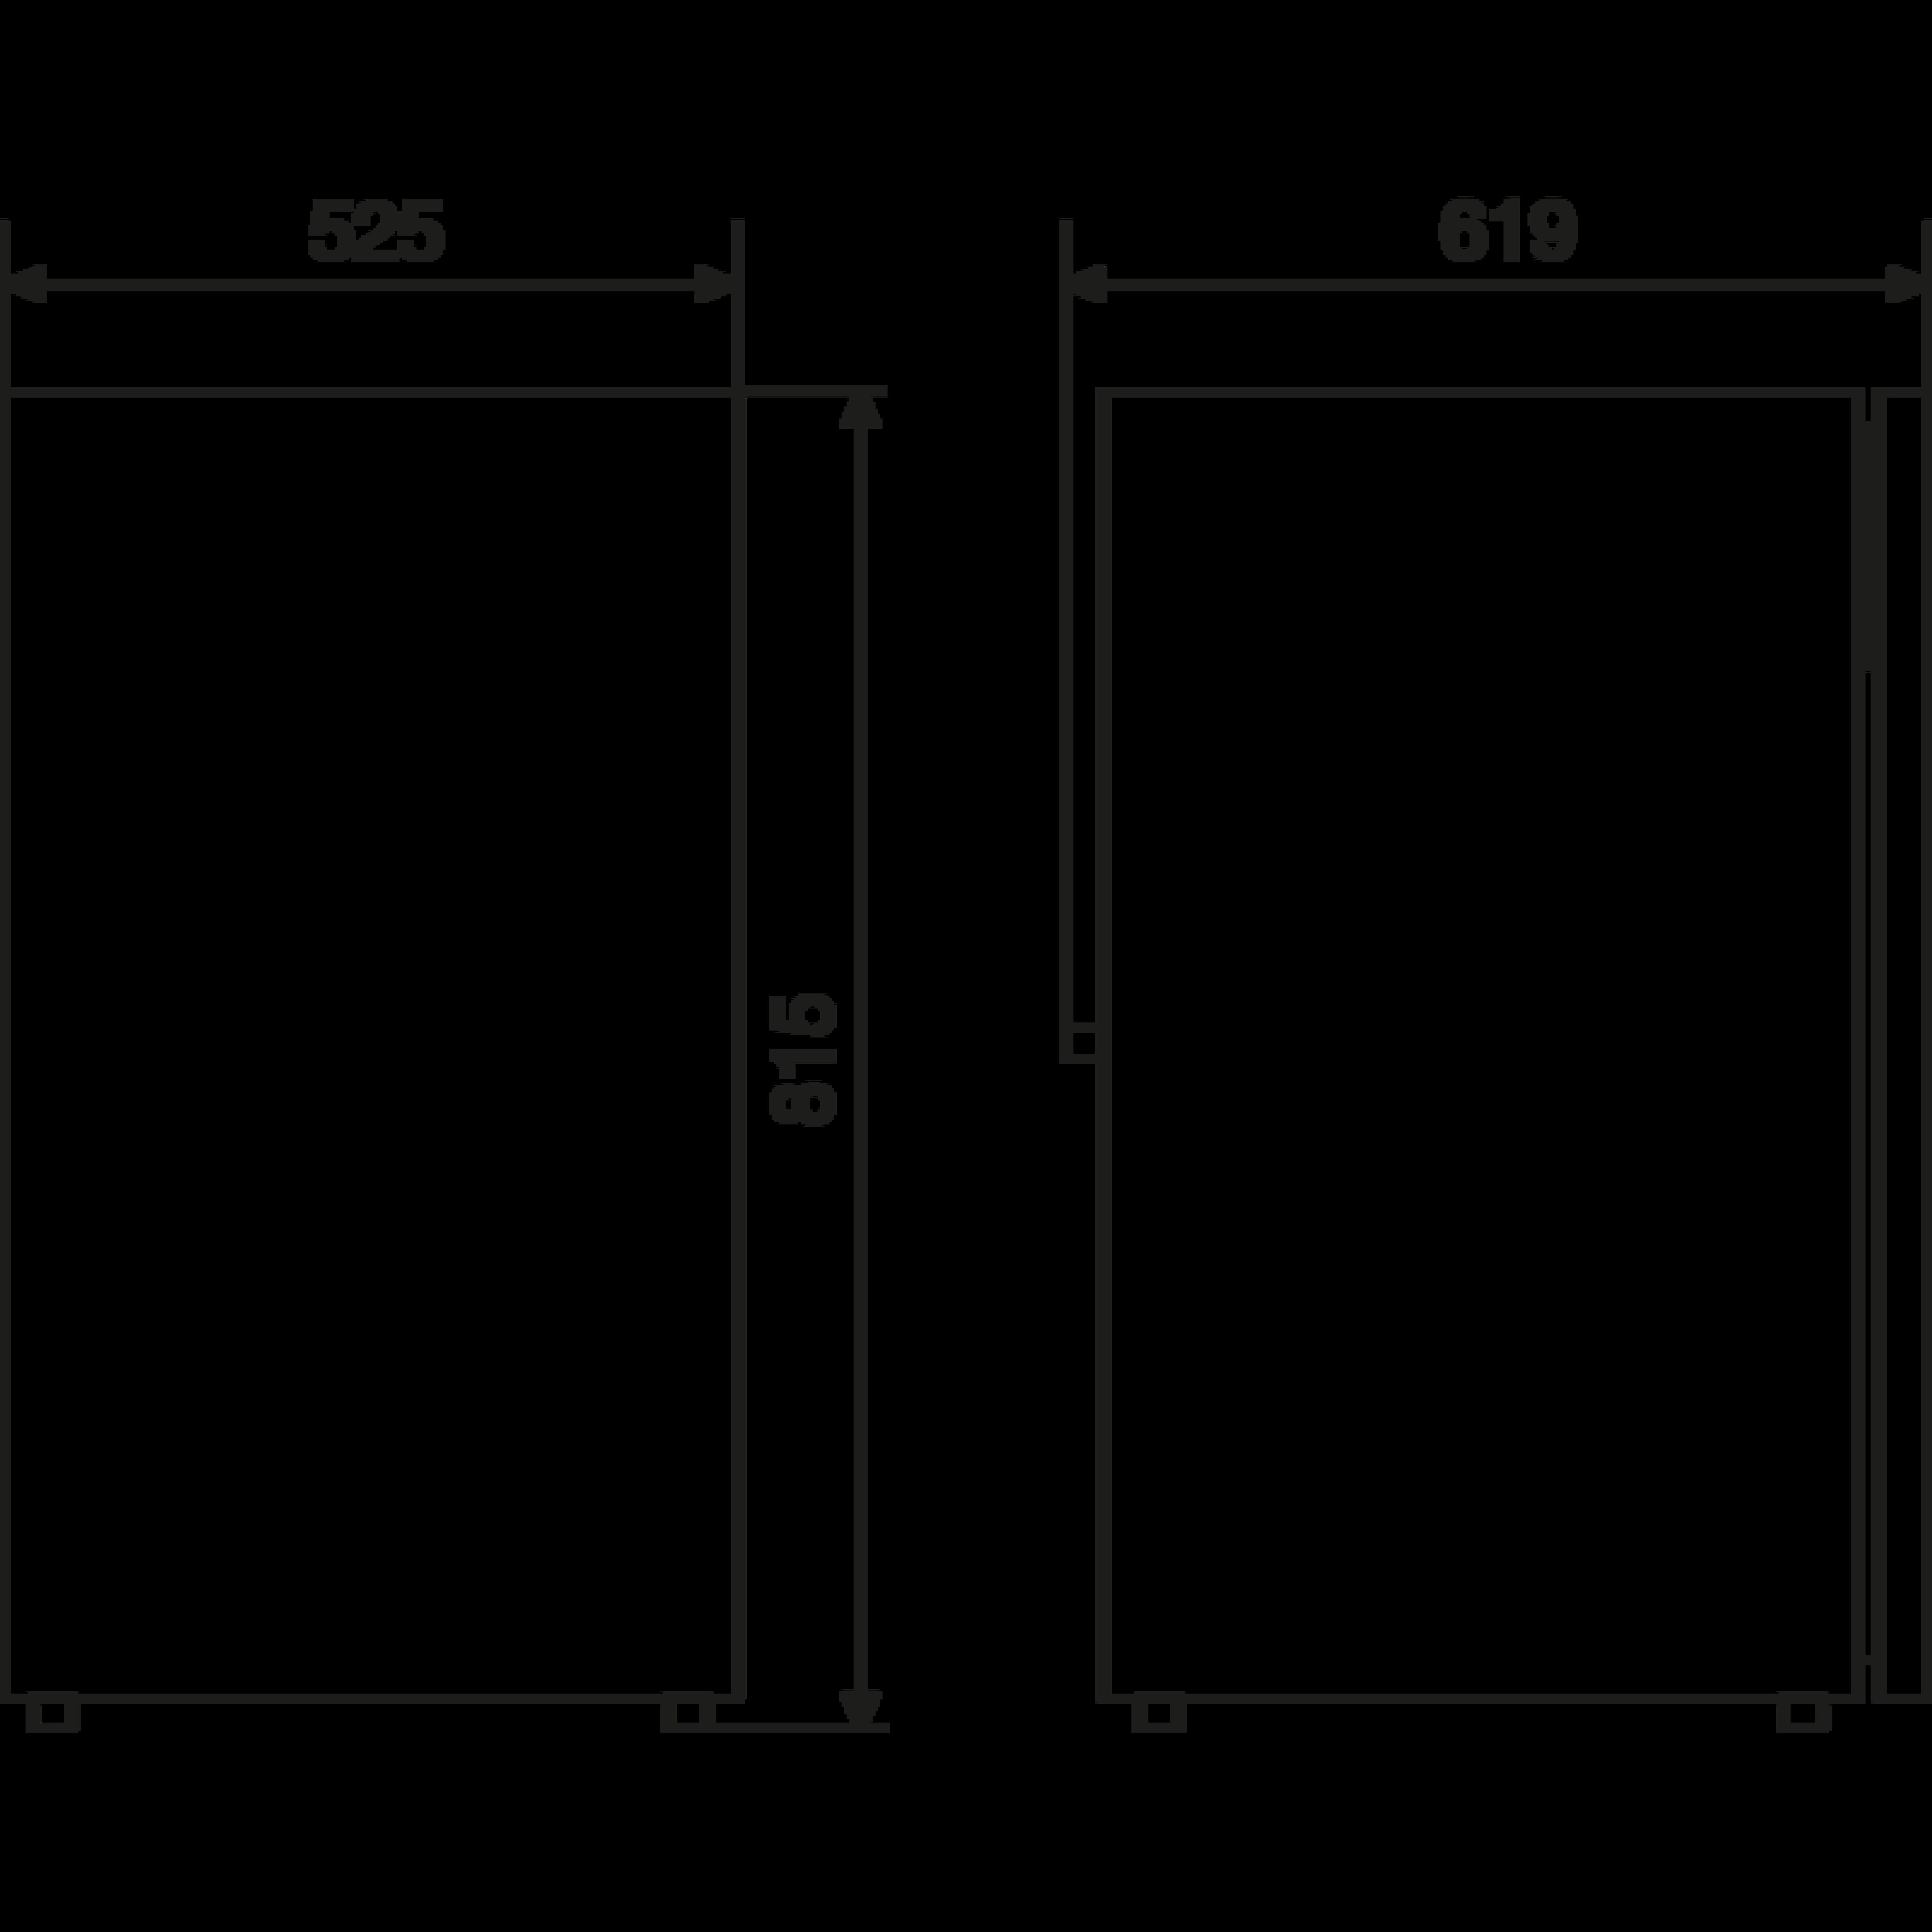 CRX 140 Dimensions